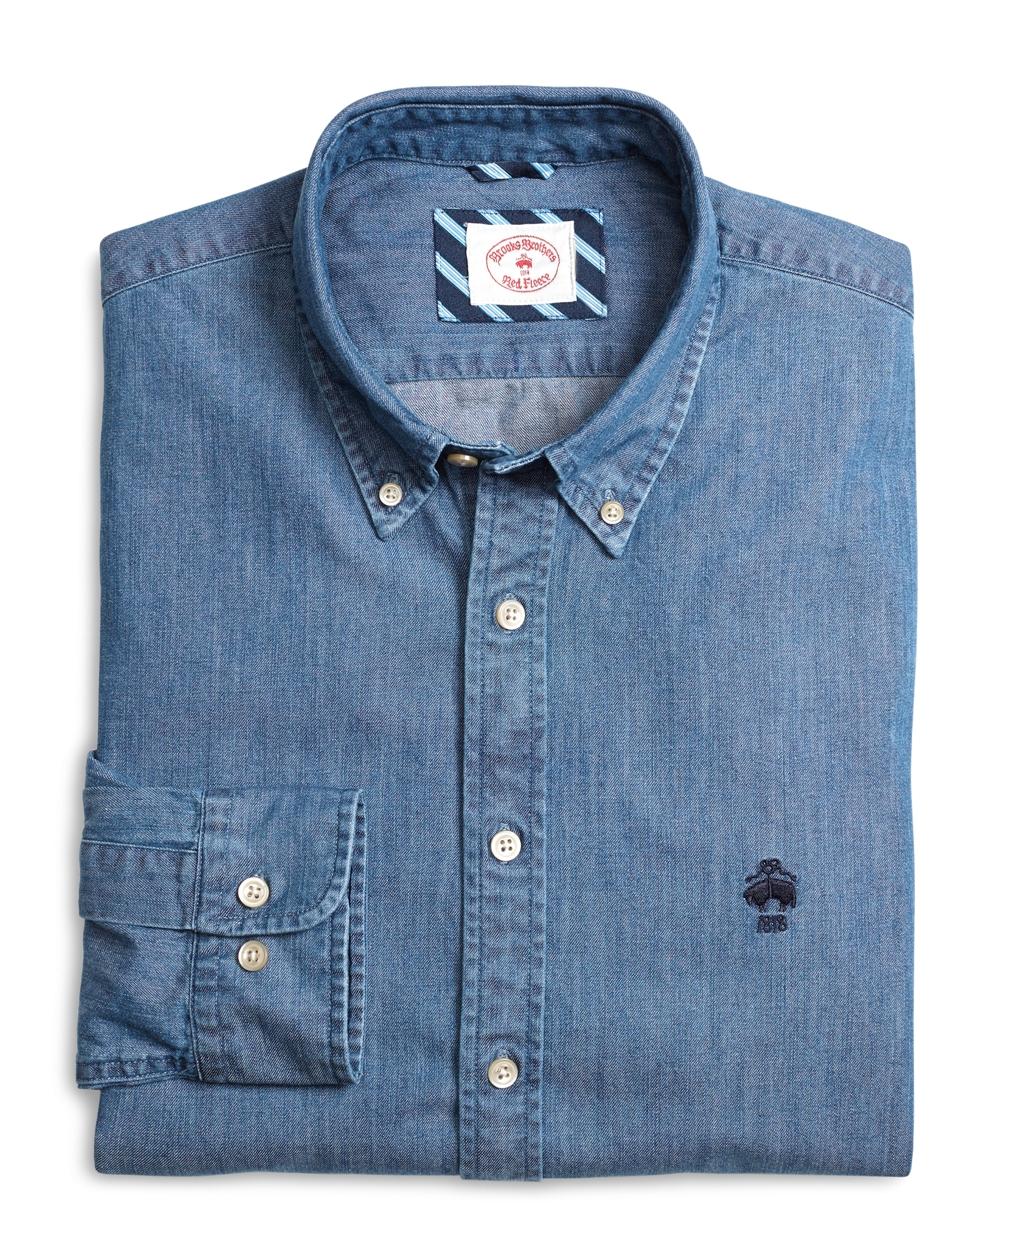 Lyst - Brooks brothers Denim Logo Sport Shirt in Blue for Men